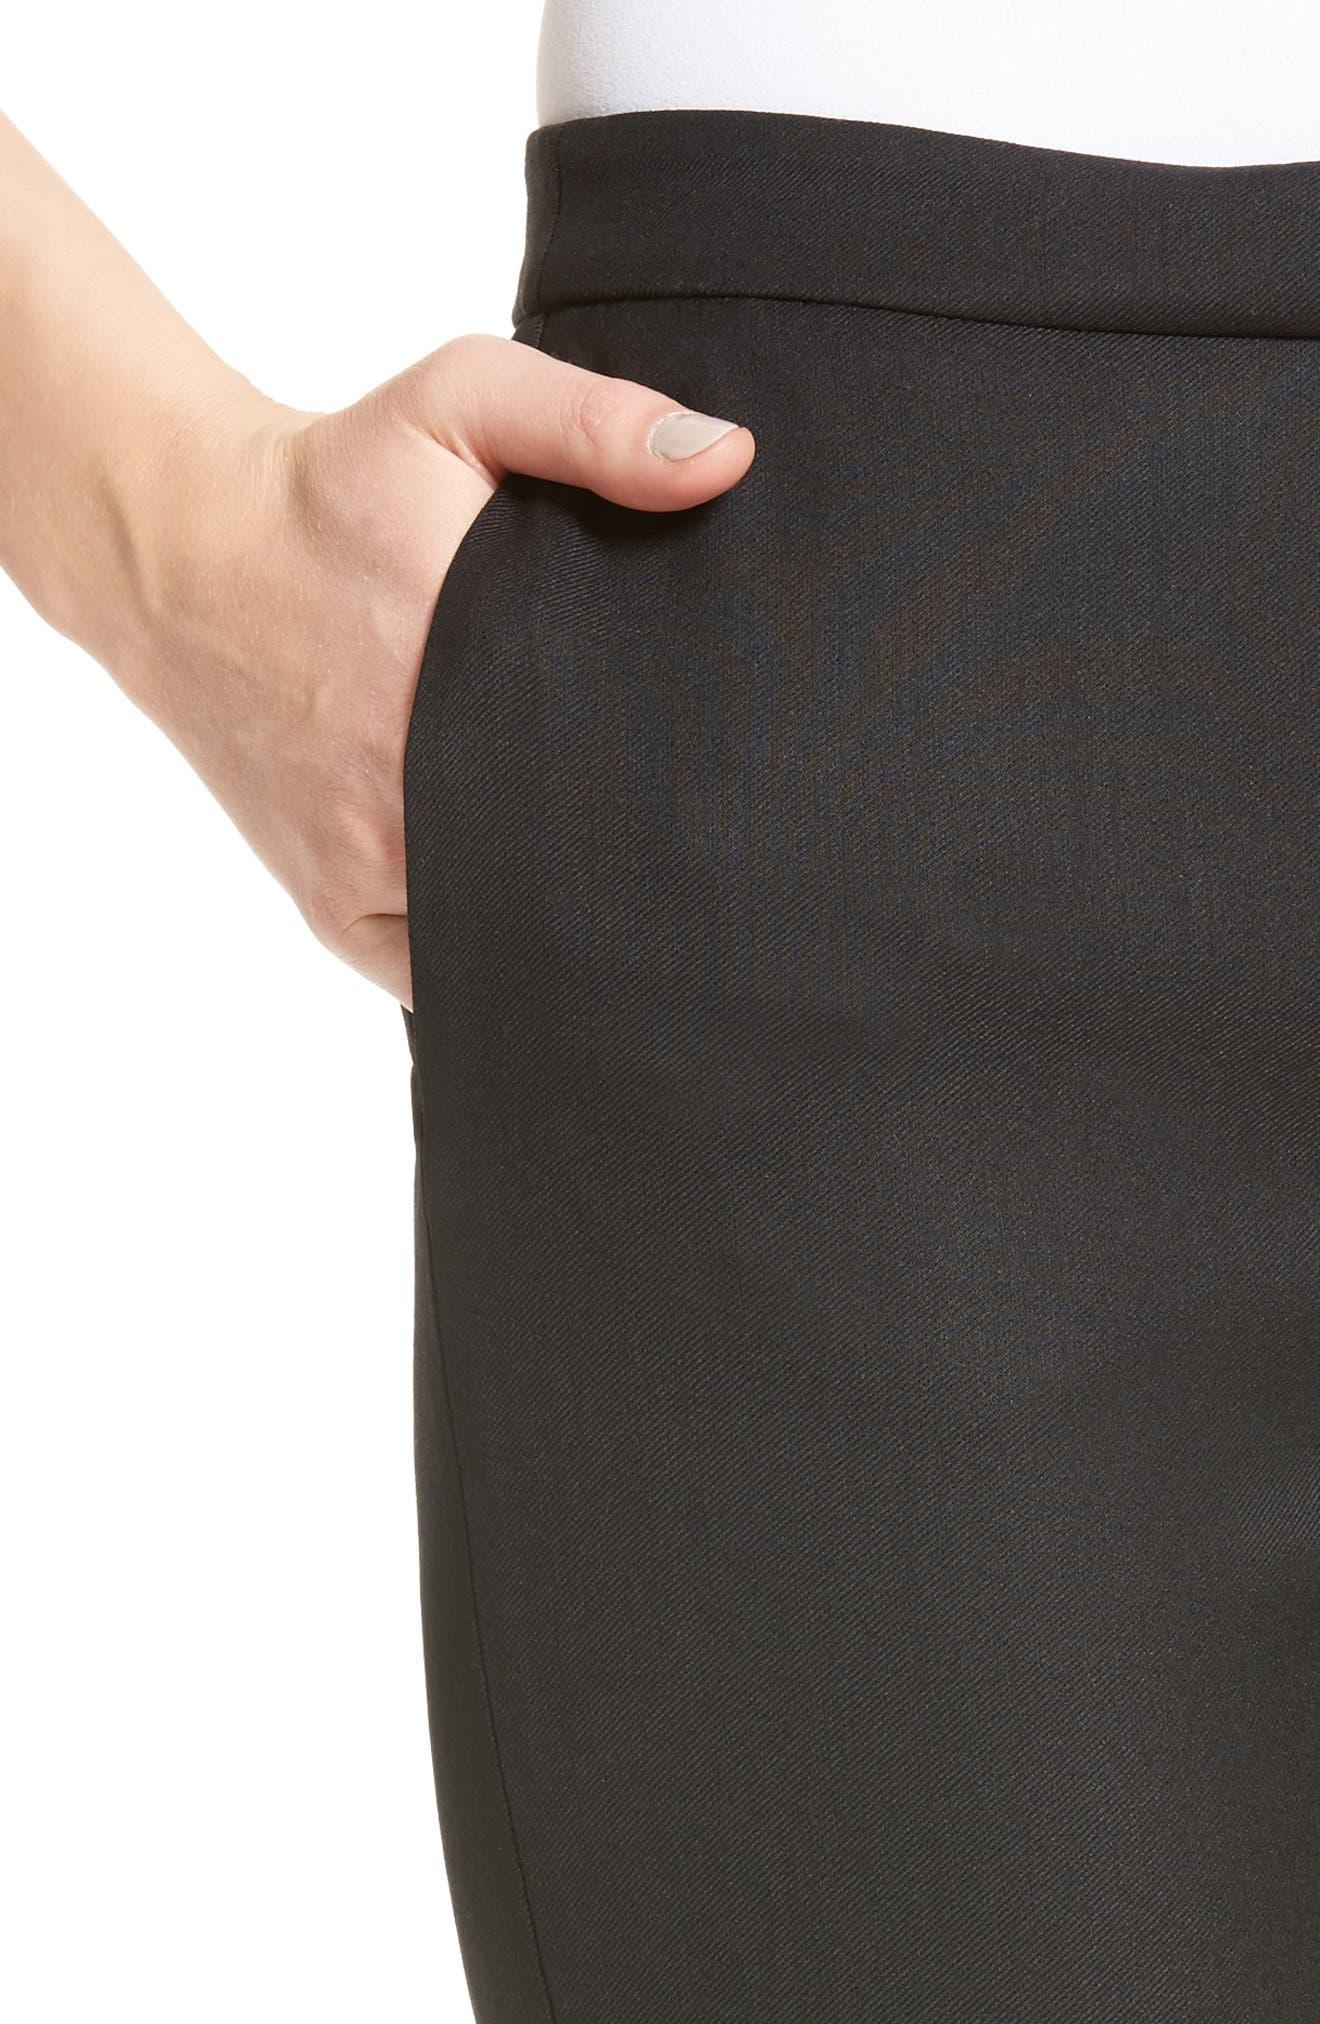 Wool Blend Skinny Pants,                             Alternate thumbnail 4, color,                             001